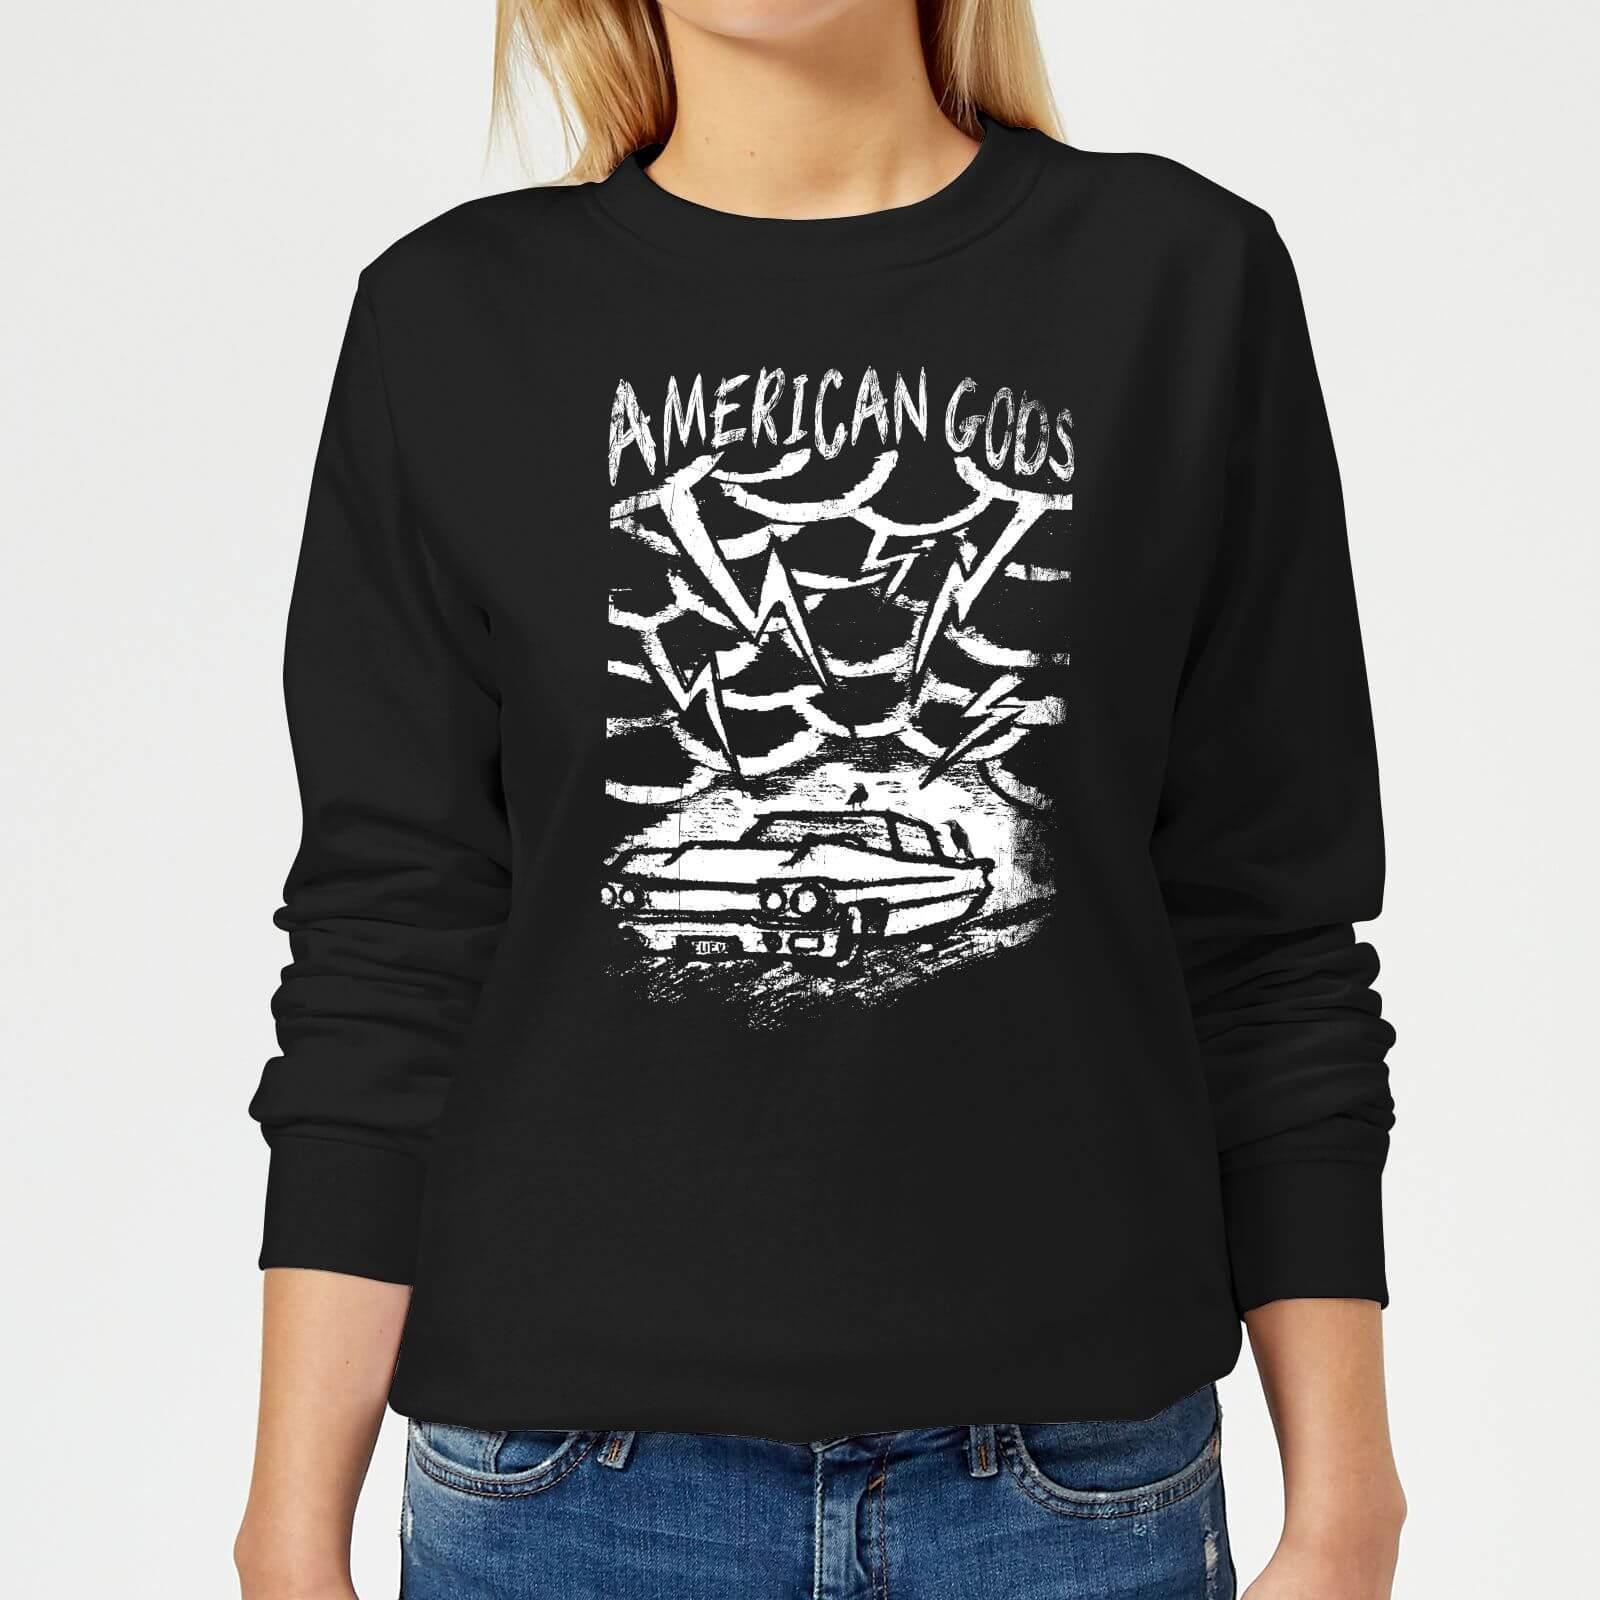 American Gods Car Storm Women's Sweatshirt - Black - XL - Black